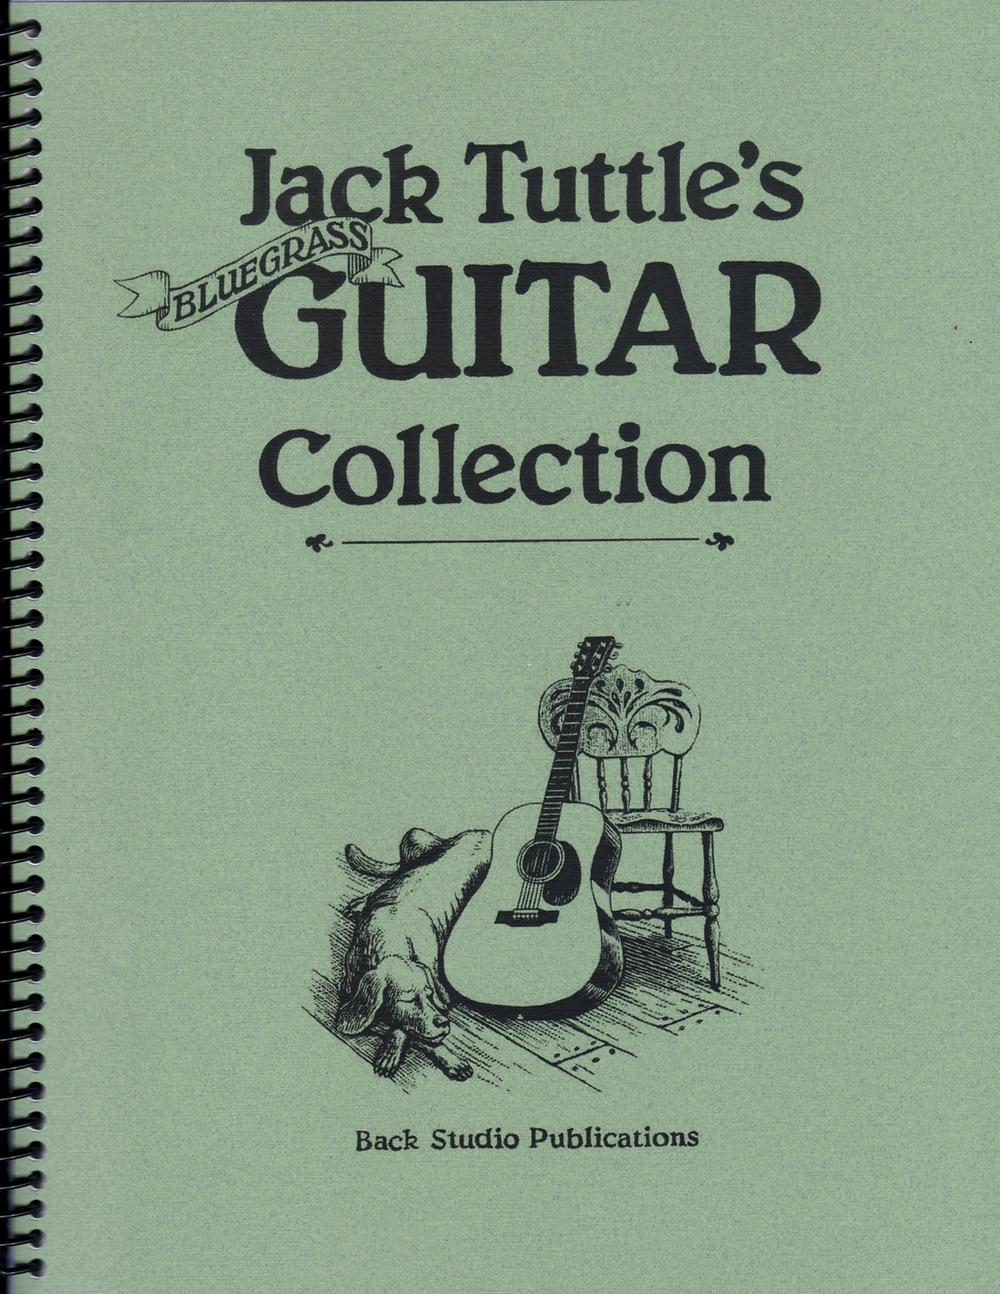 Jack Tuttle's Bluegrass Guitar Collection, Vol. 2